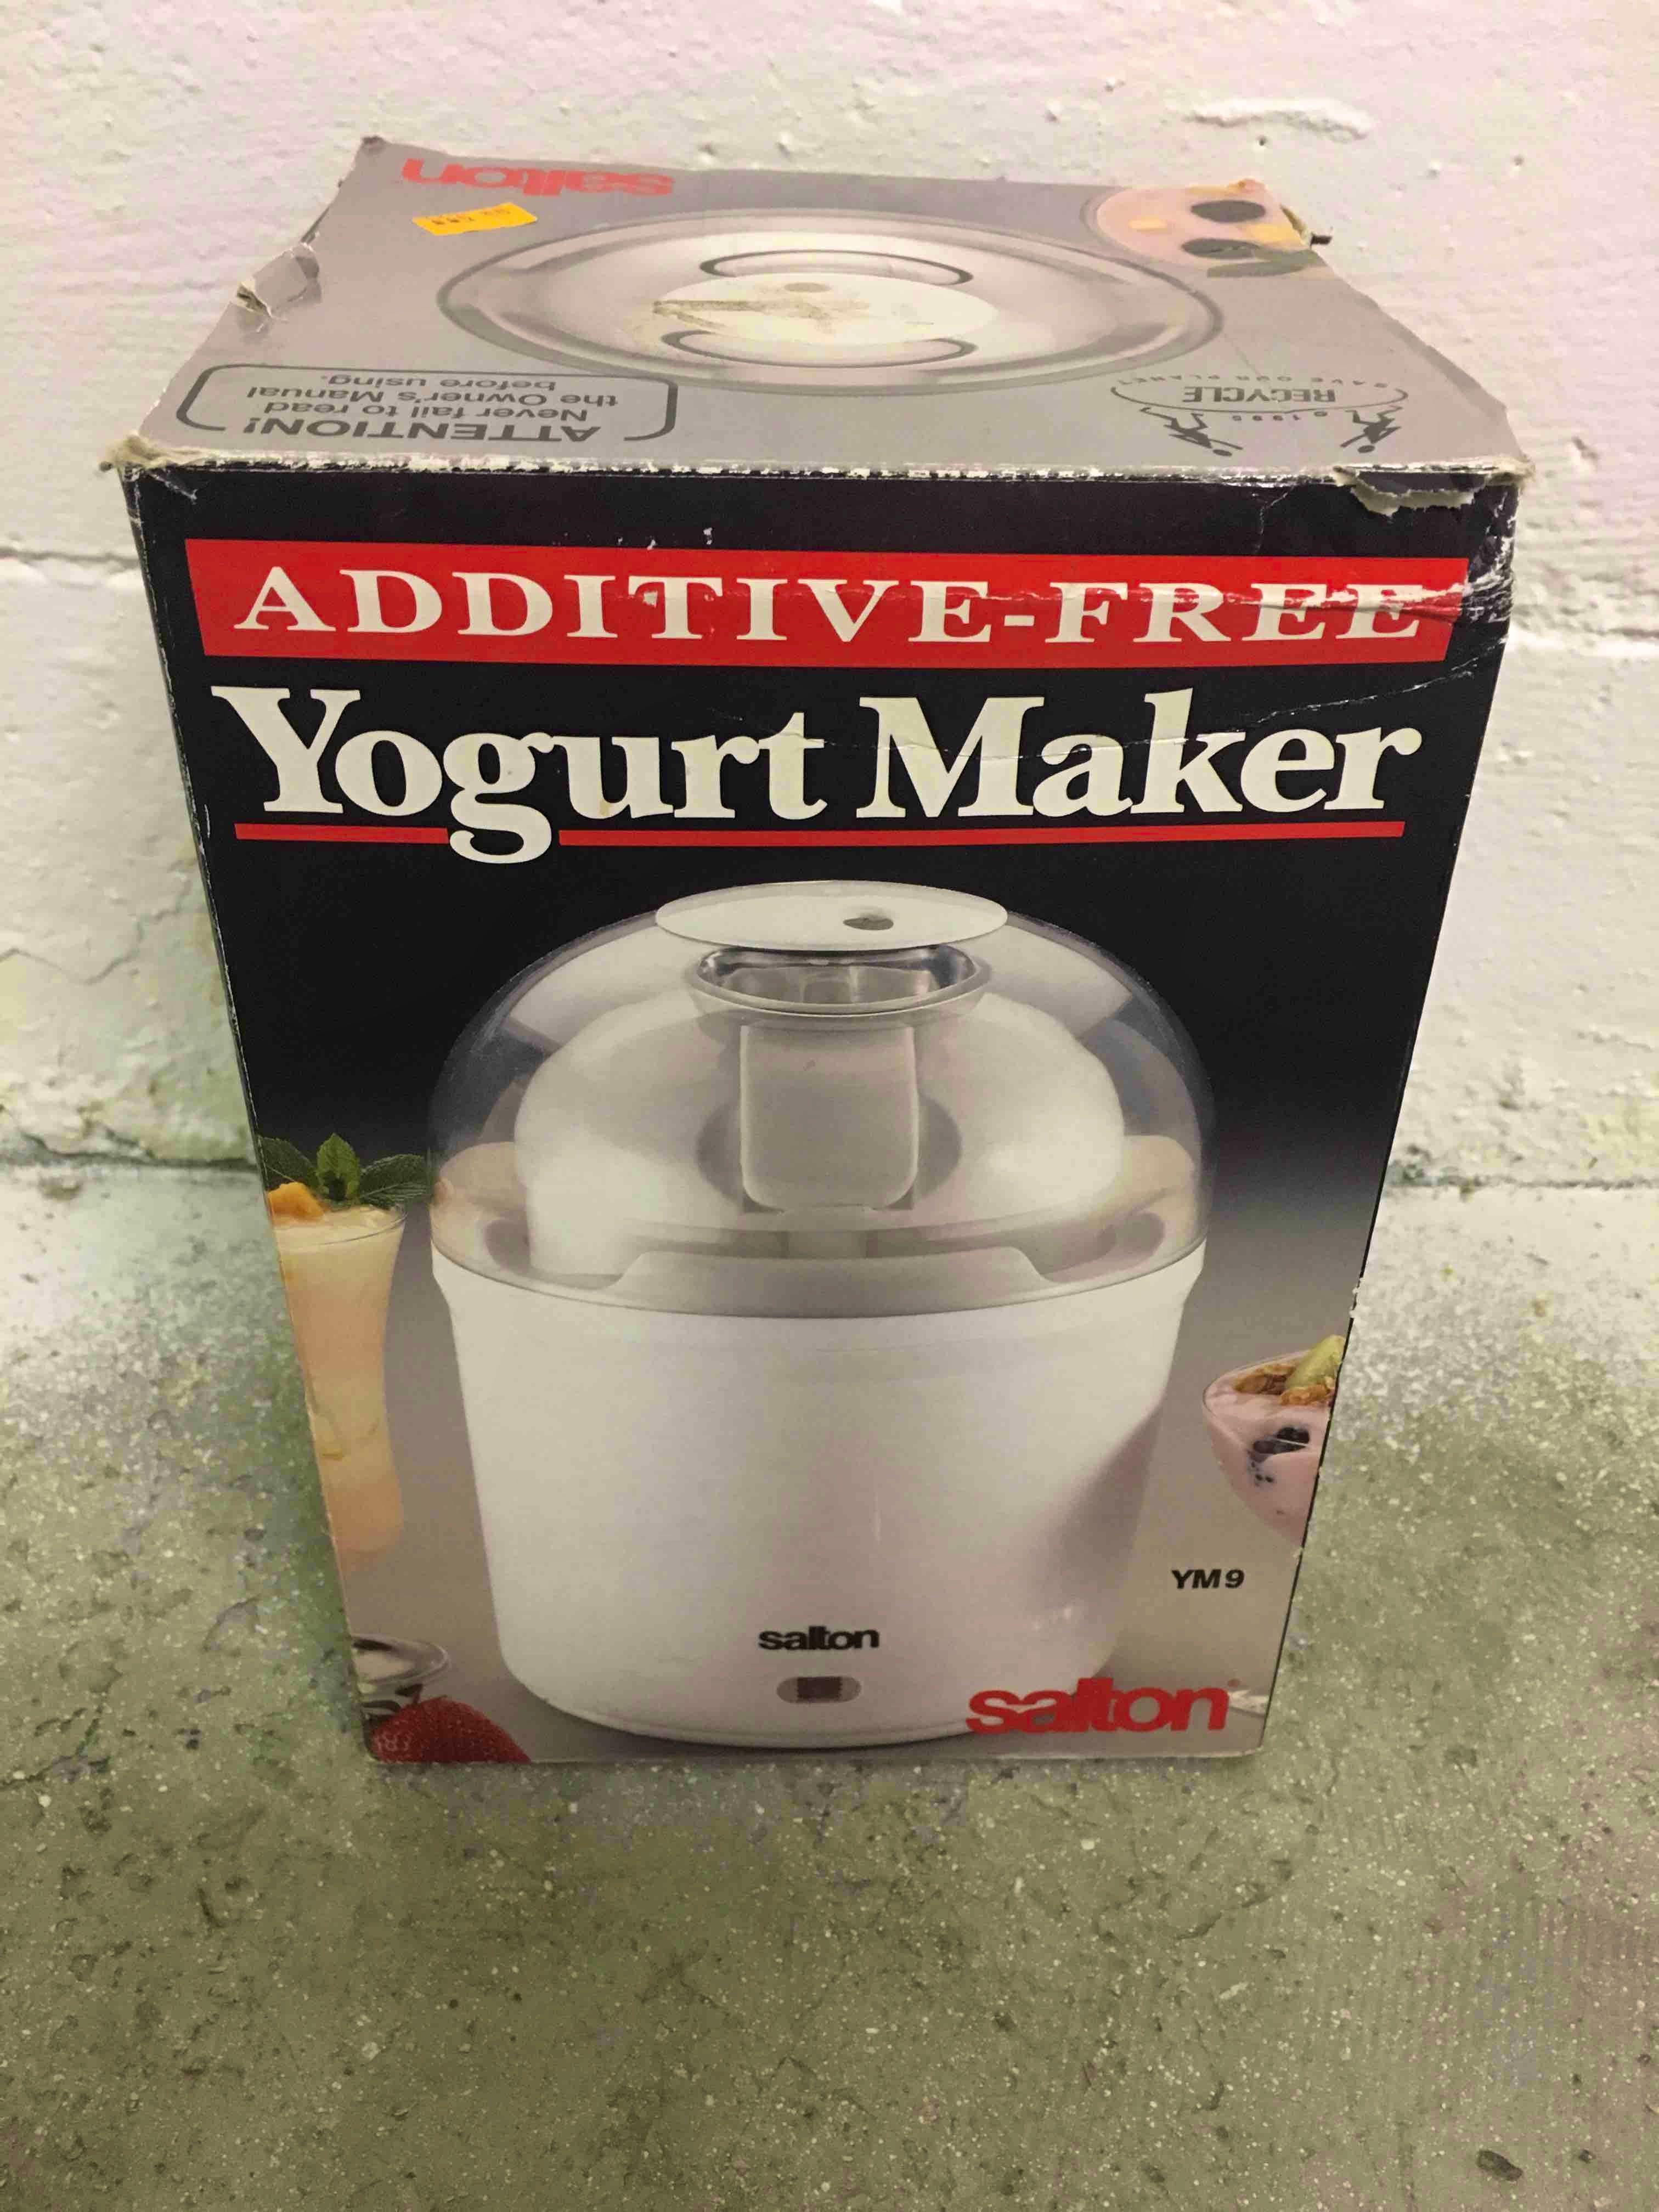 Salton yogurt maker